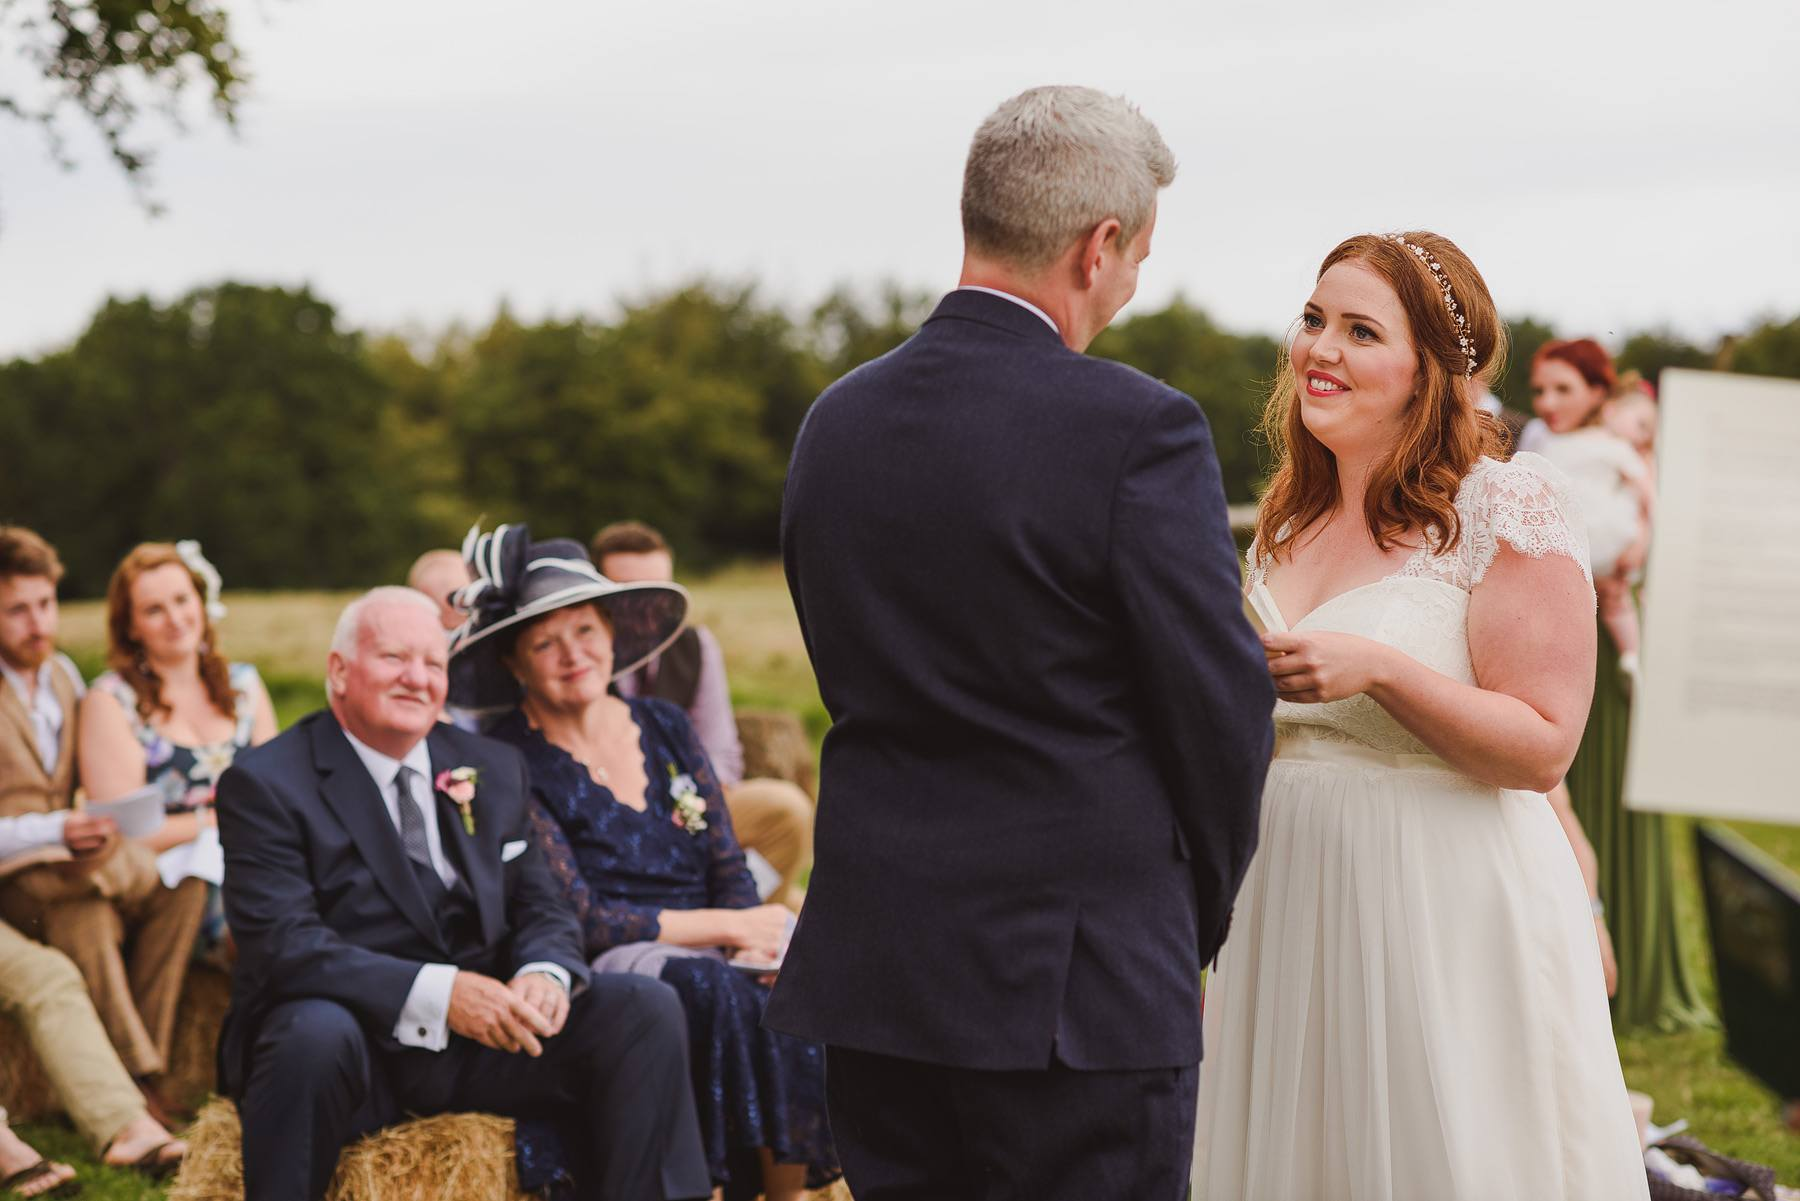 wedding ceremony at huntstile organic farm stone circle